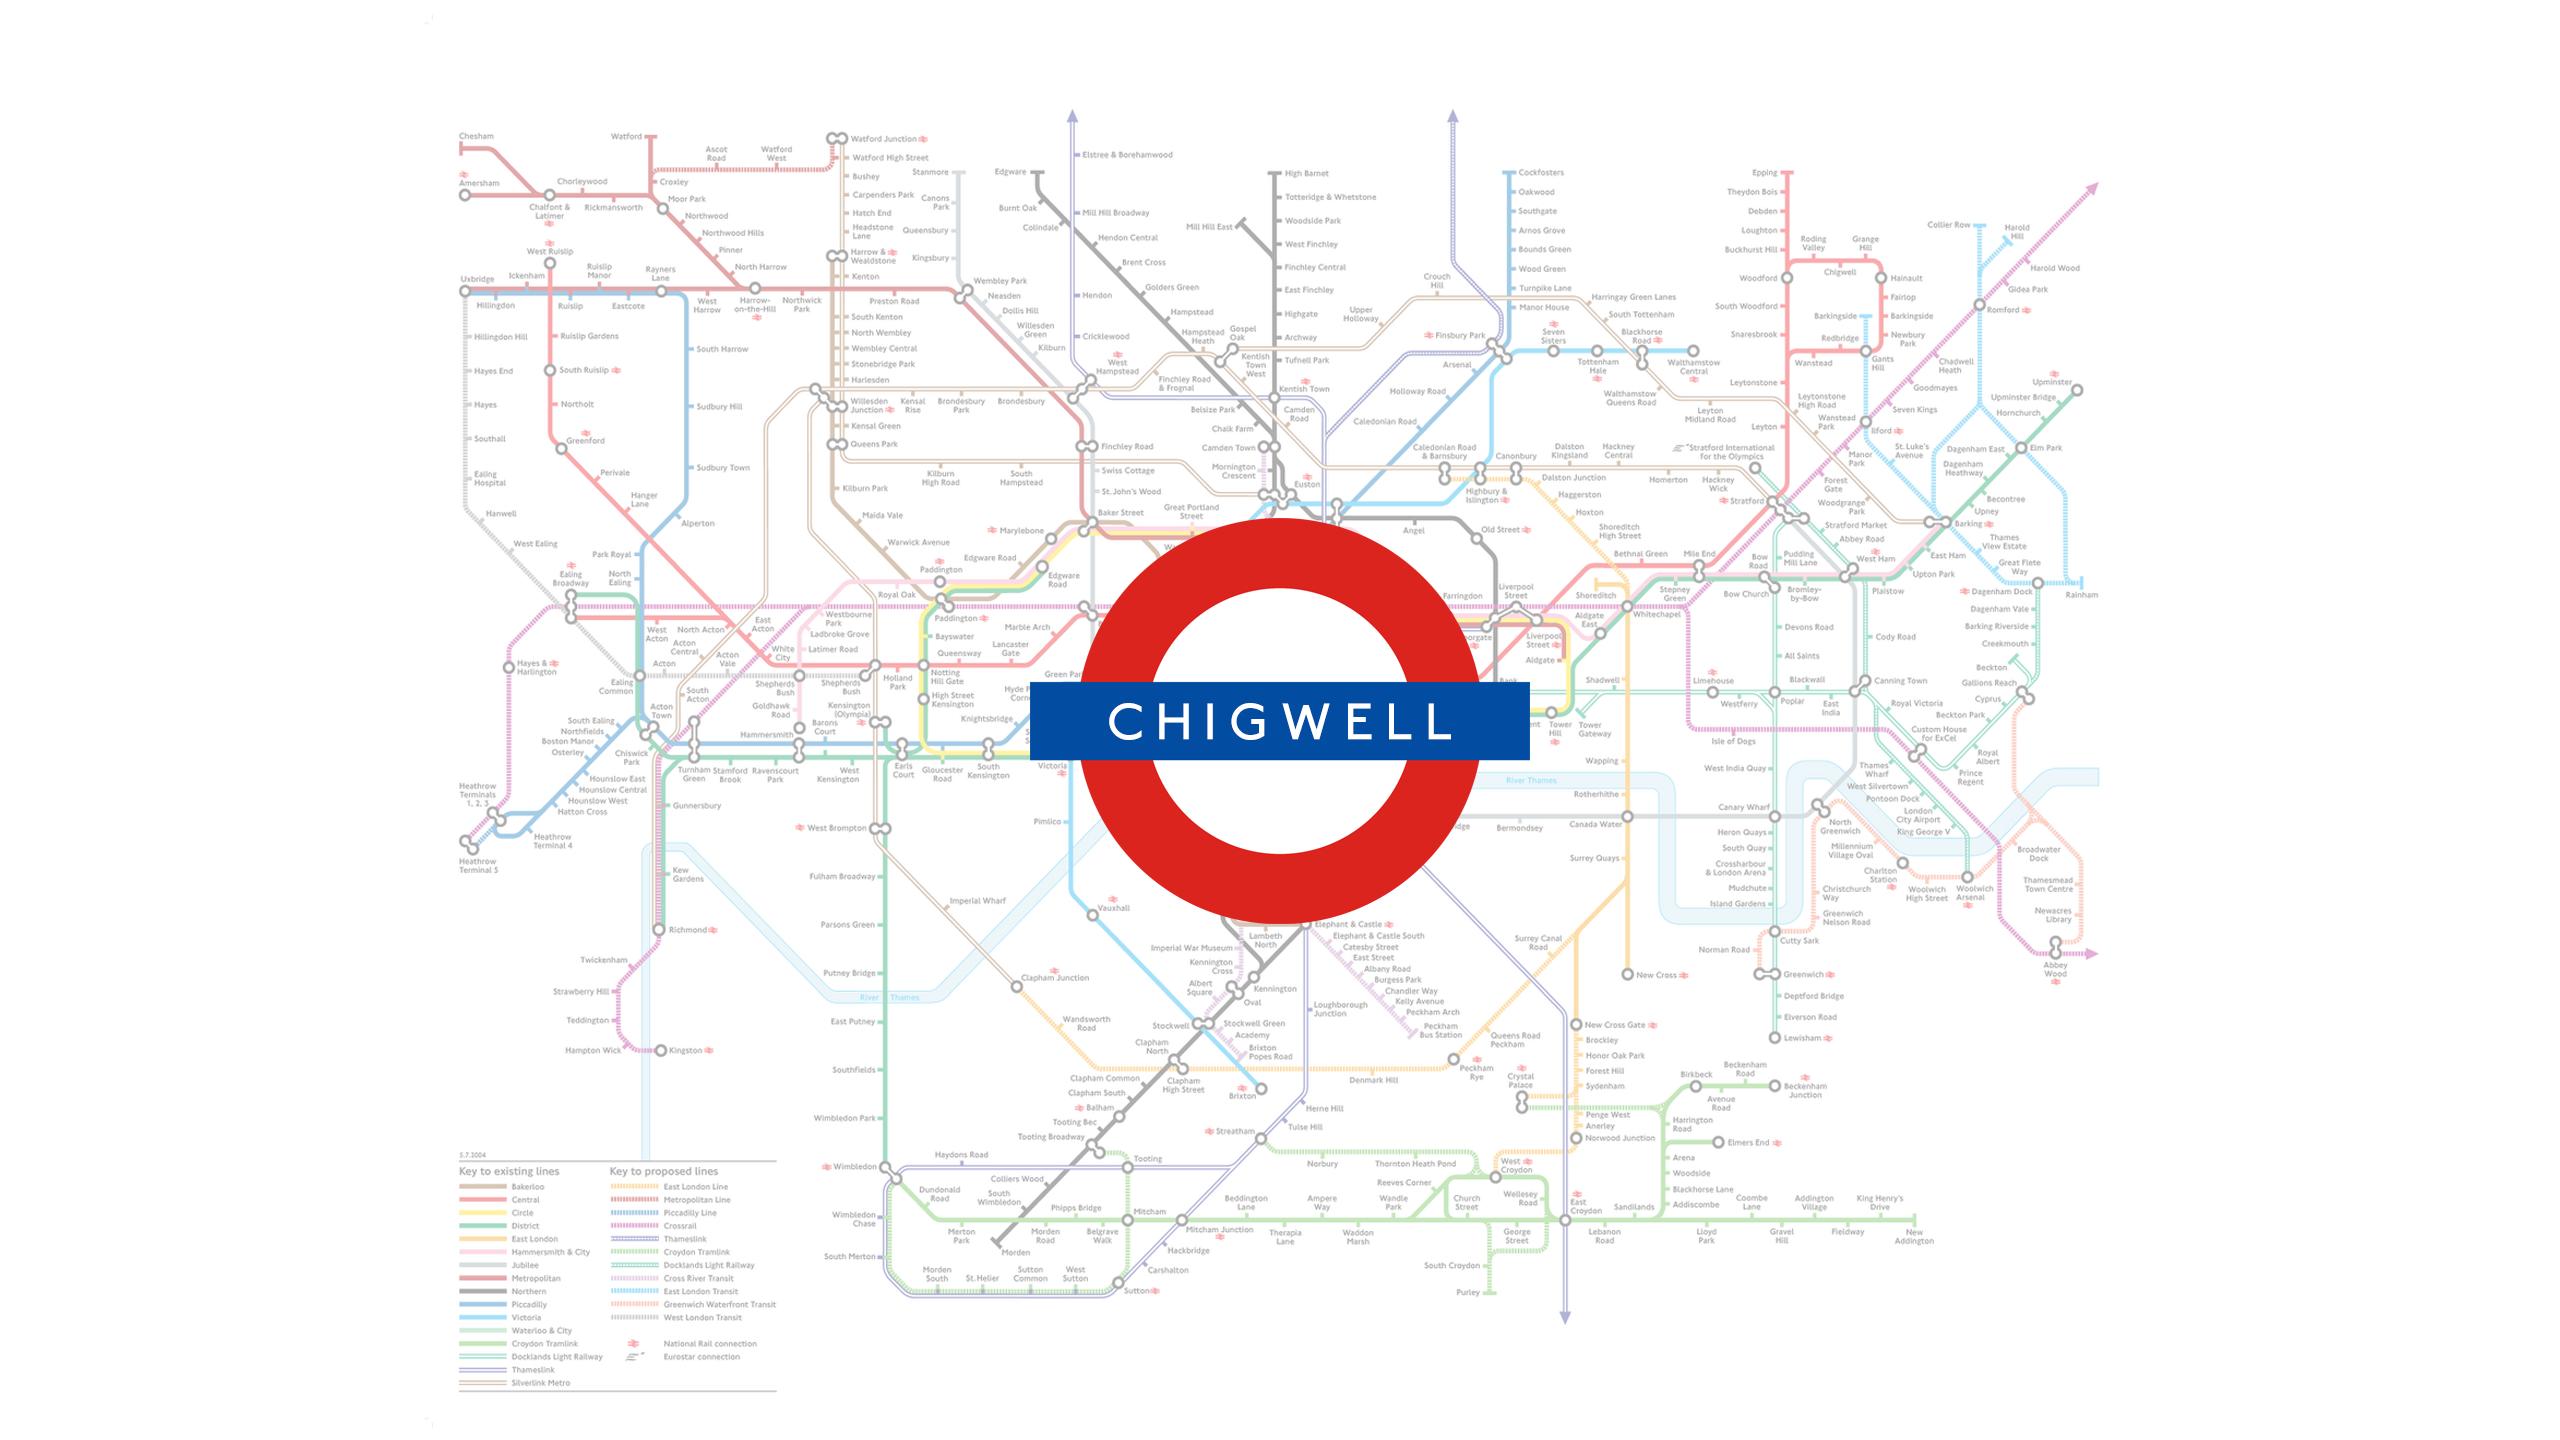 Chigwell (Map)